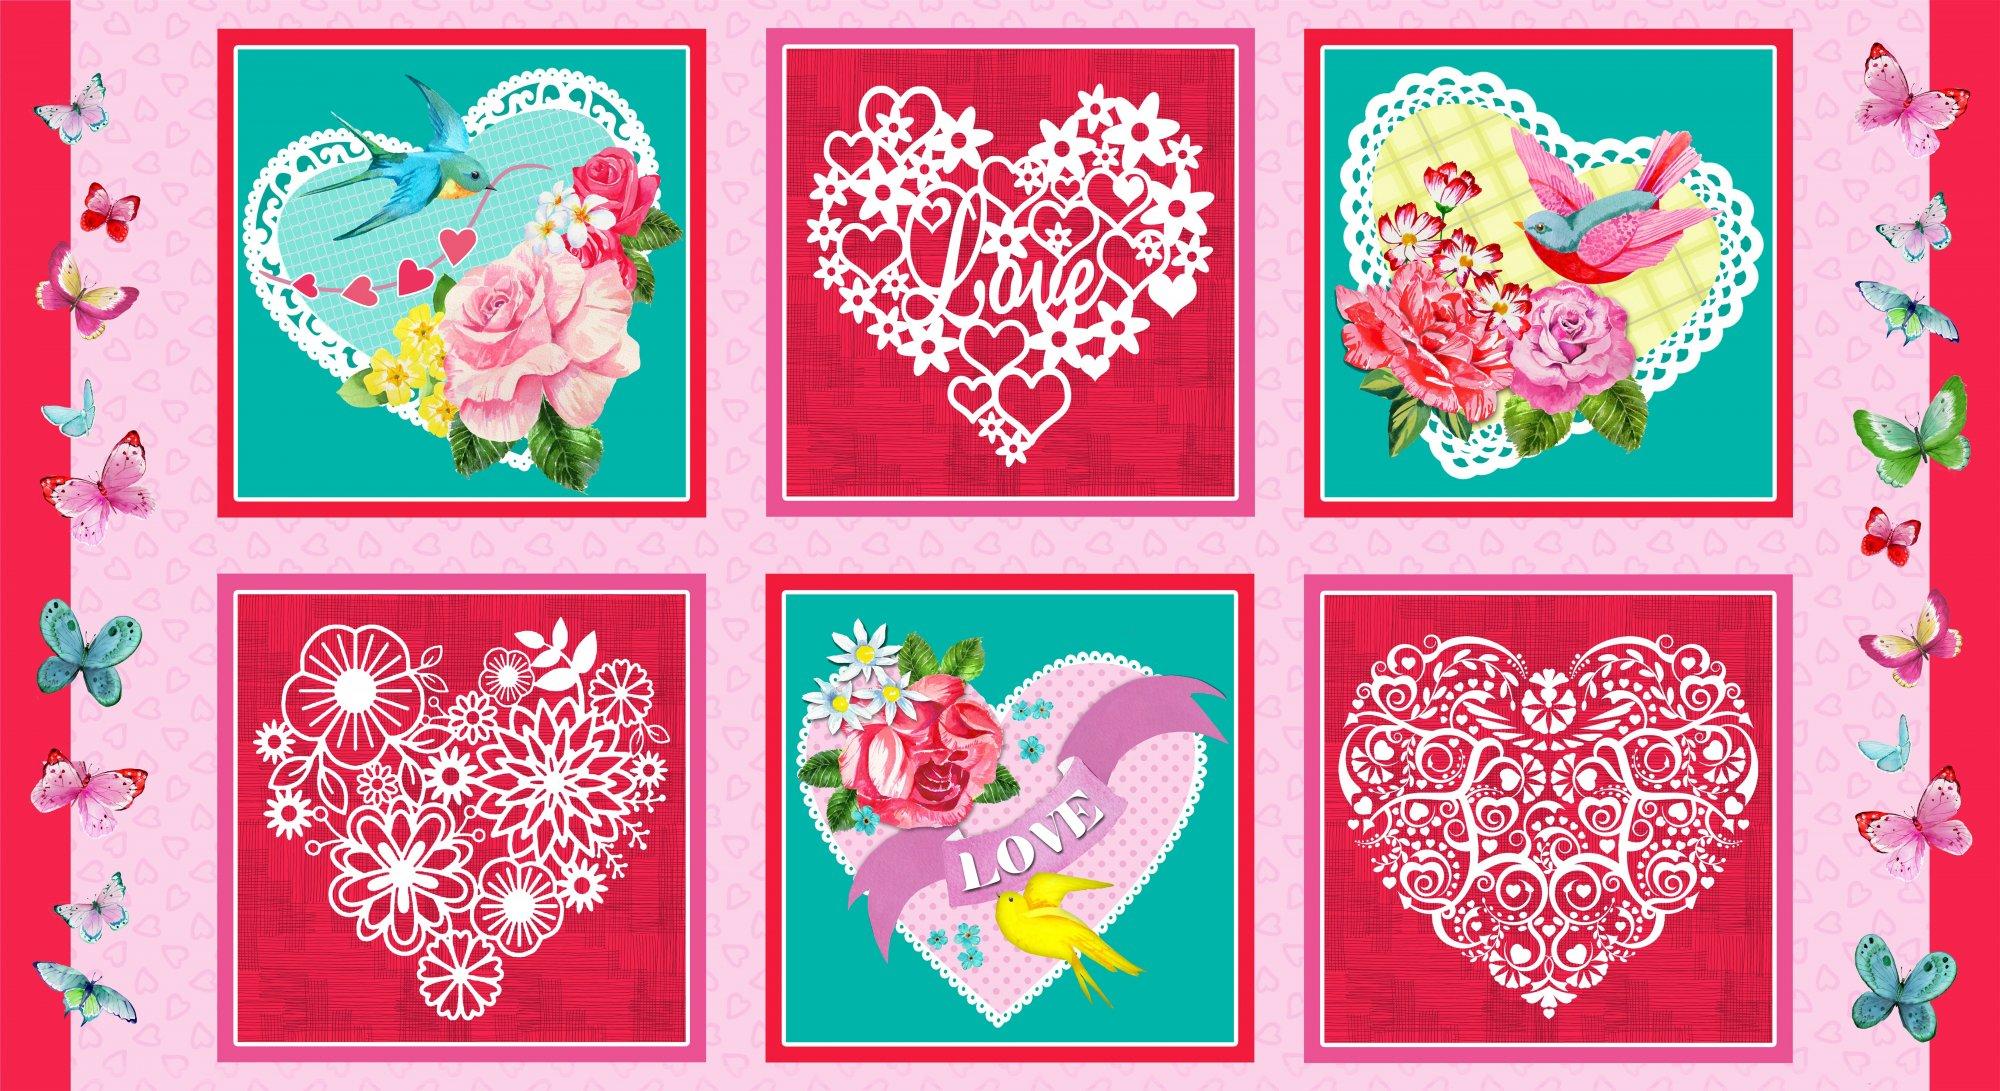 HG-Heart & Soul 9435-22 Pink/Multi - 24 Heart Blocks Repeat